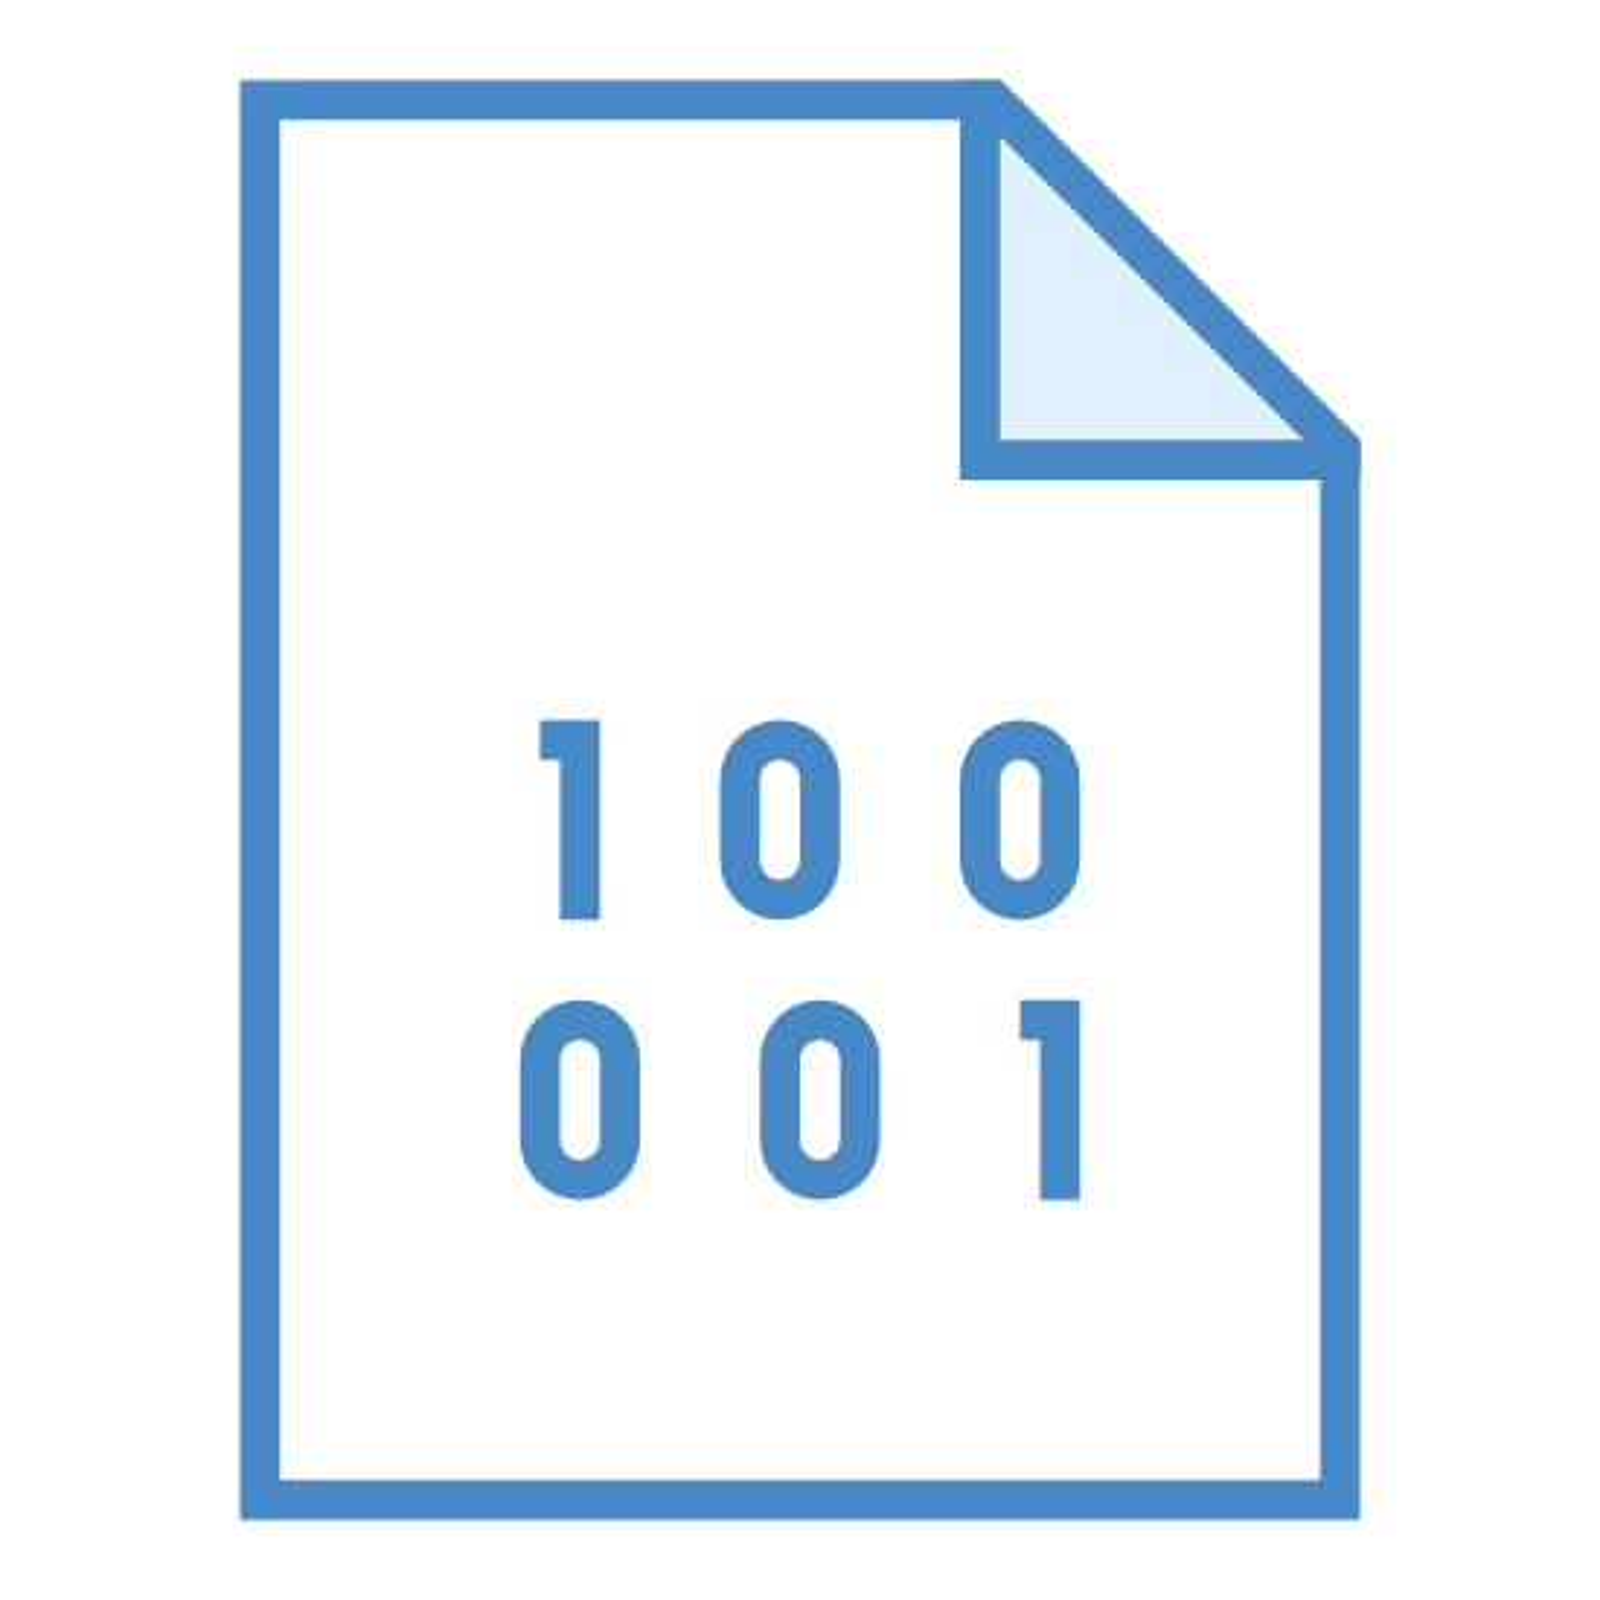 Plik Binarny icon